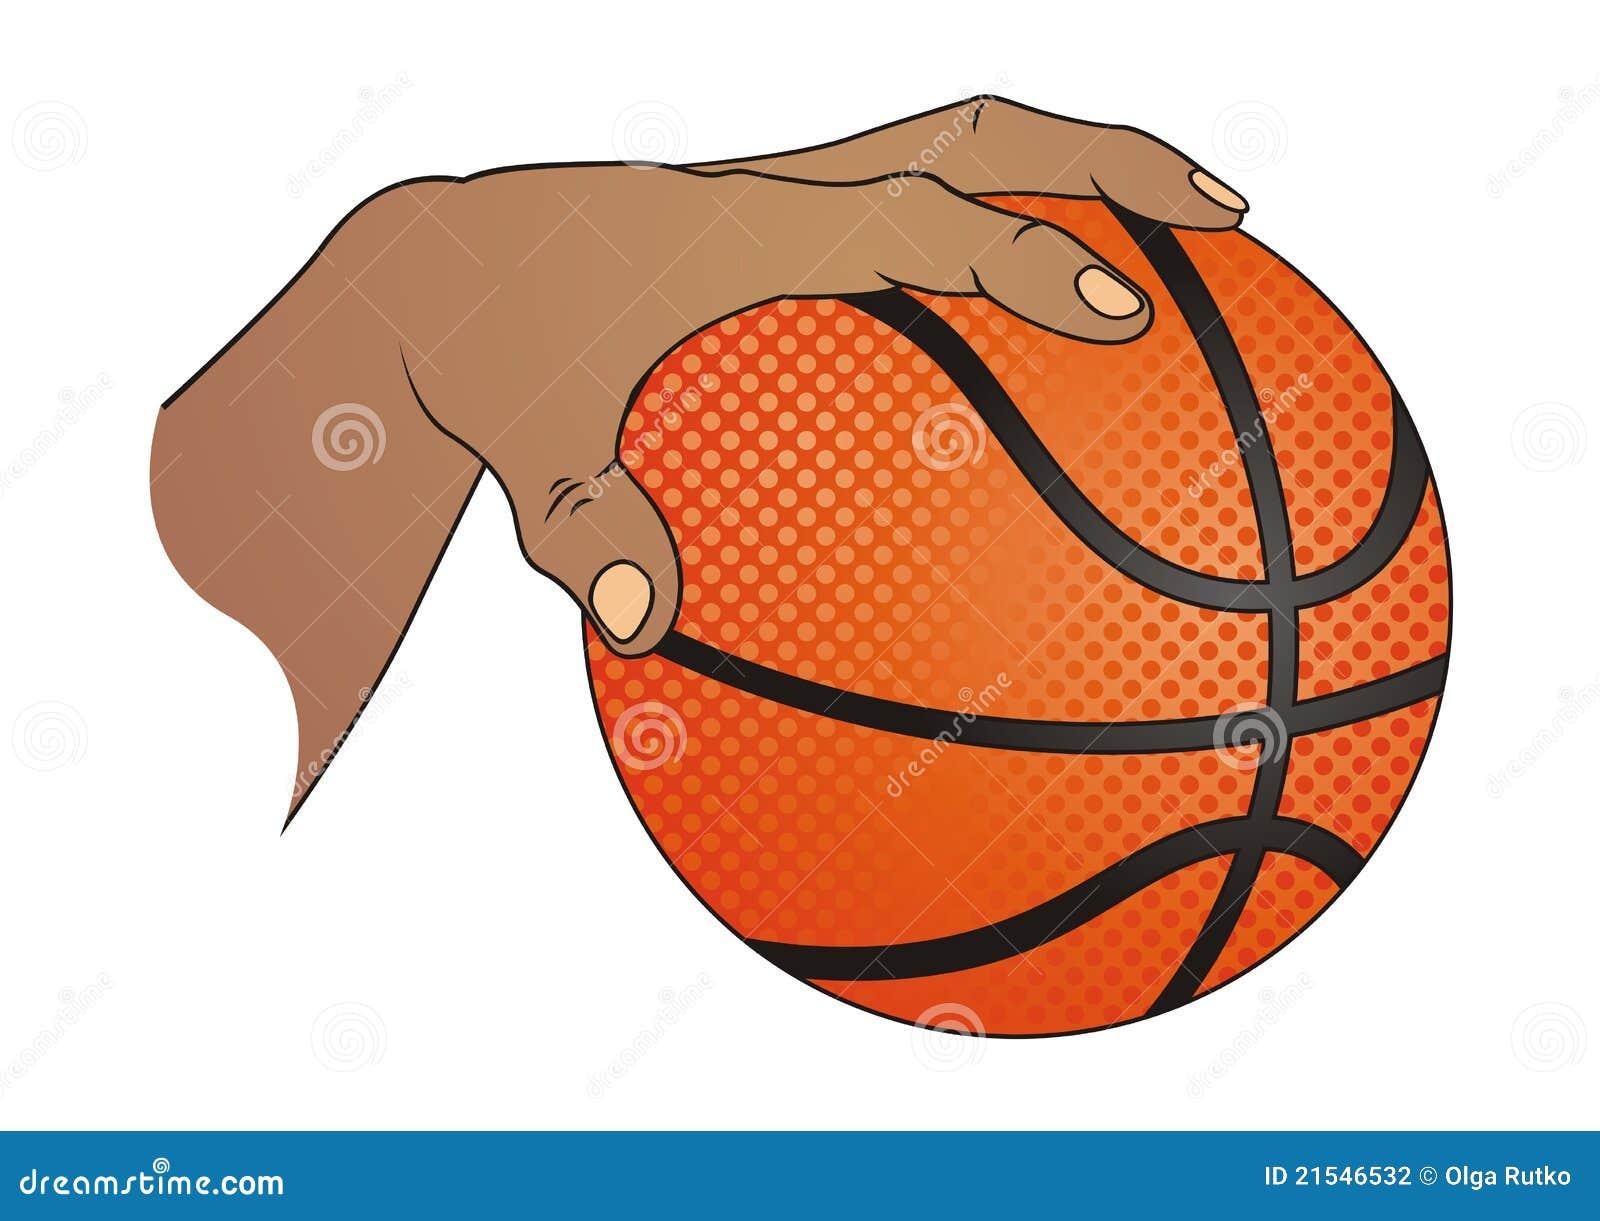 Hand With Basketball Stock Photography - Image: 21546532